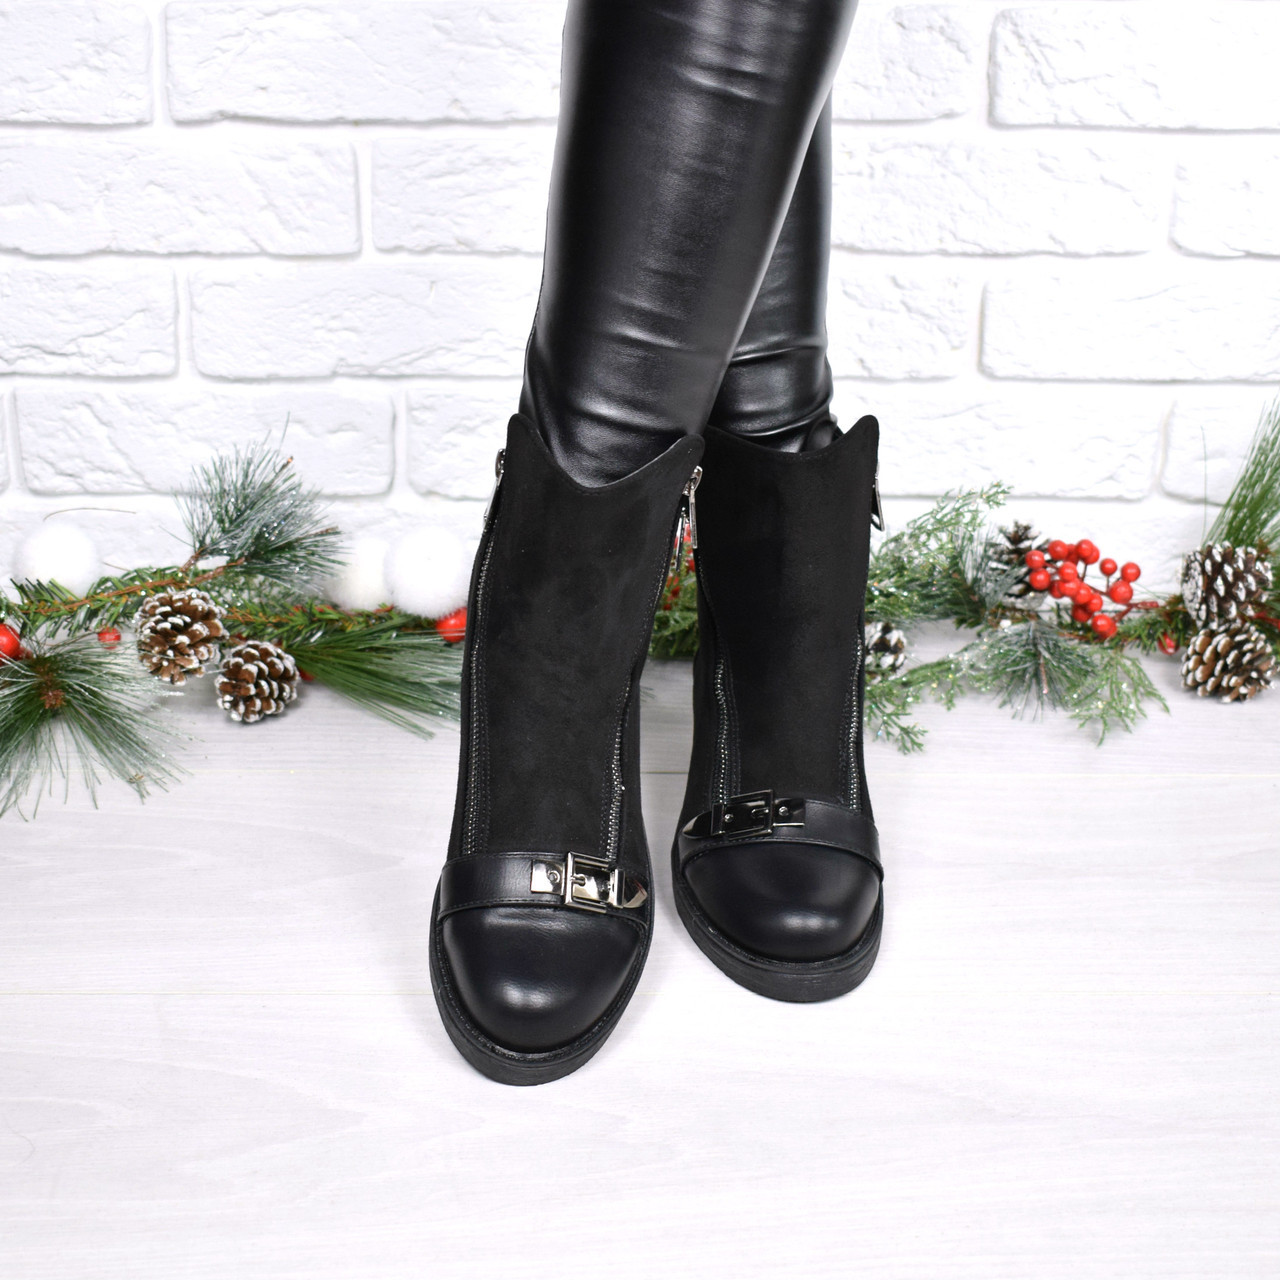 Ботинки женские Rock деми 4048, ботинки демисезонные  продажа, цена ... 181b6303a80